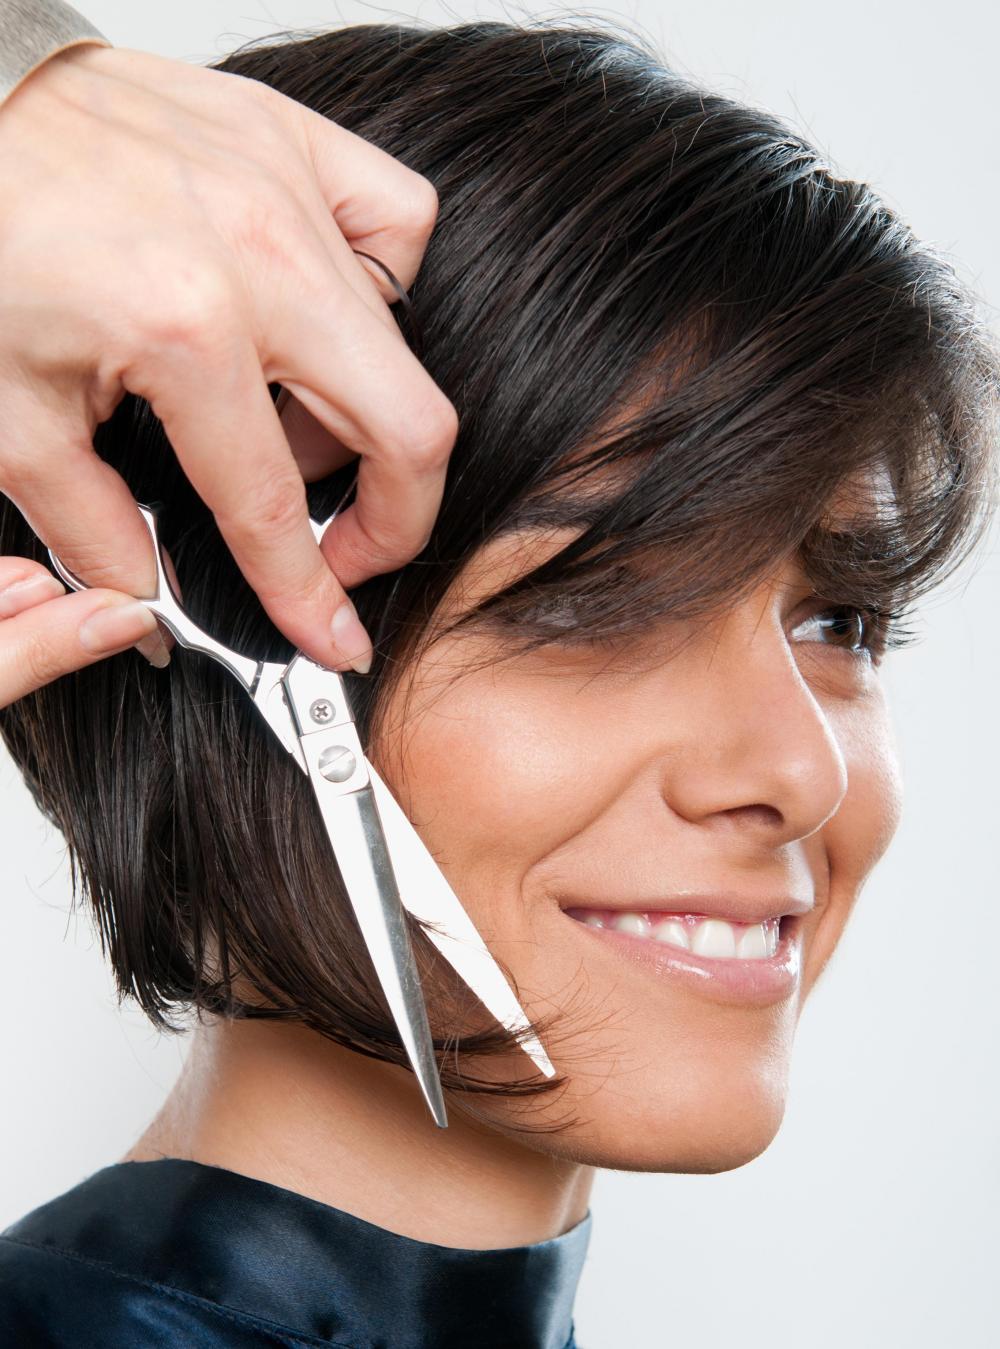 Hair Salon Cutting